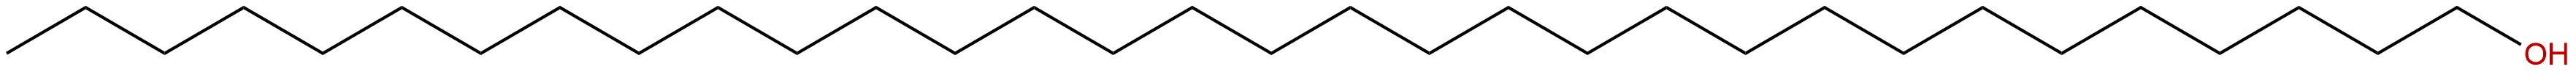 1-dotriacontanol